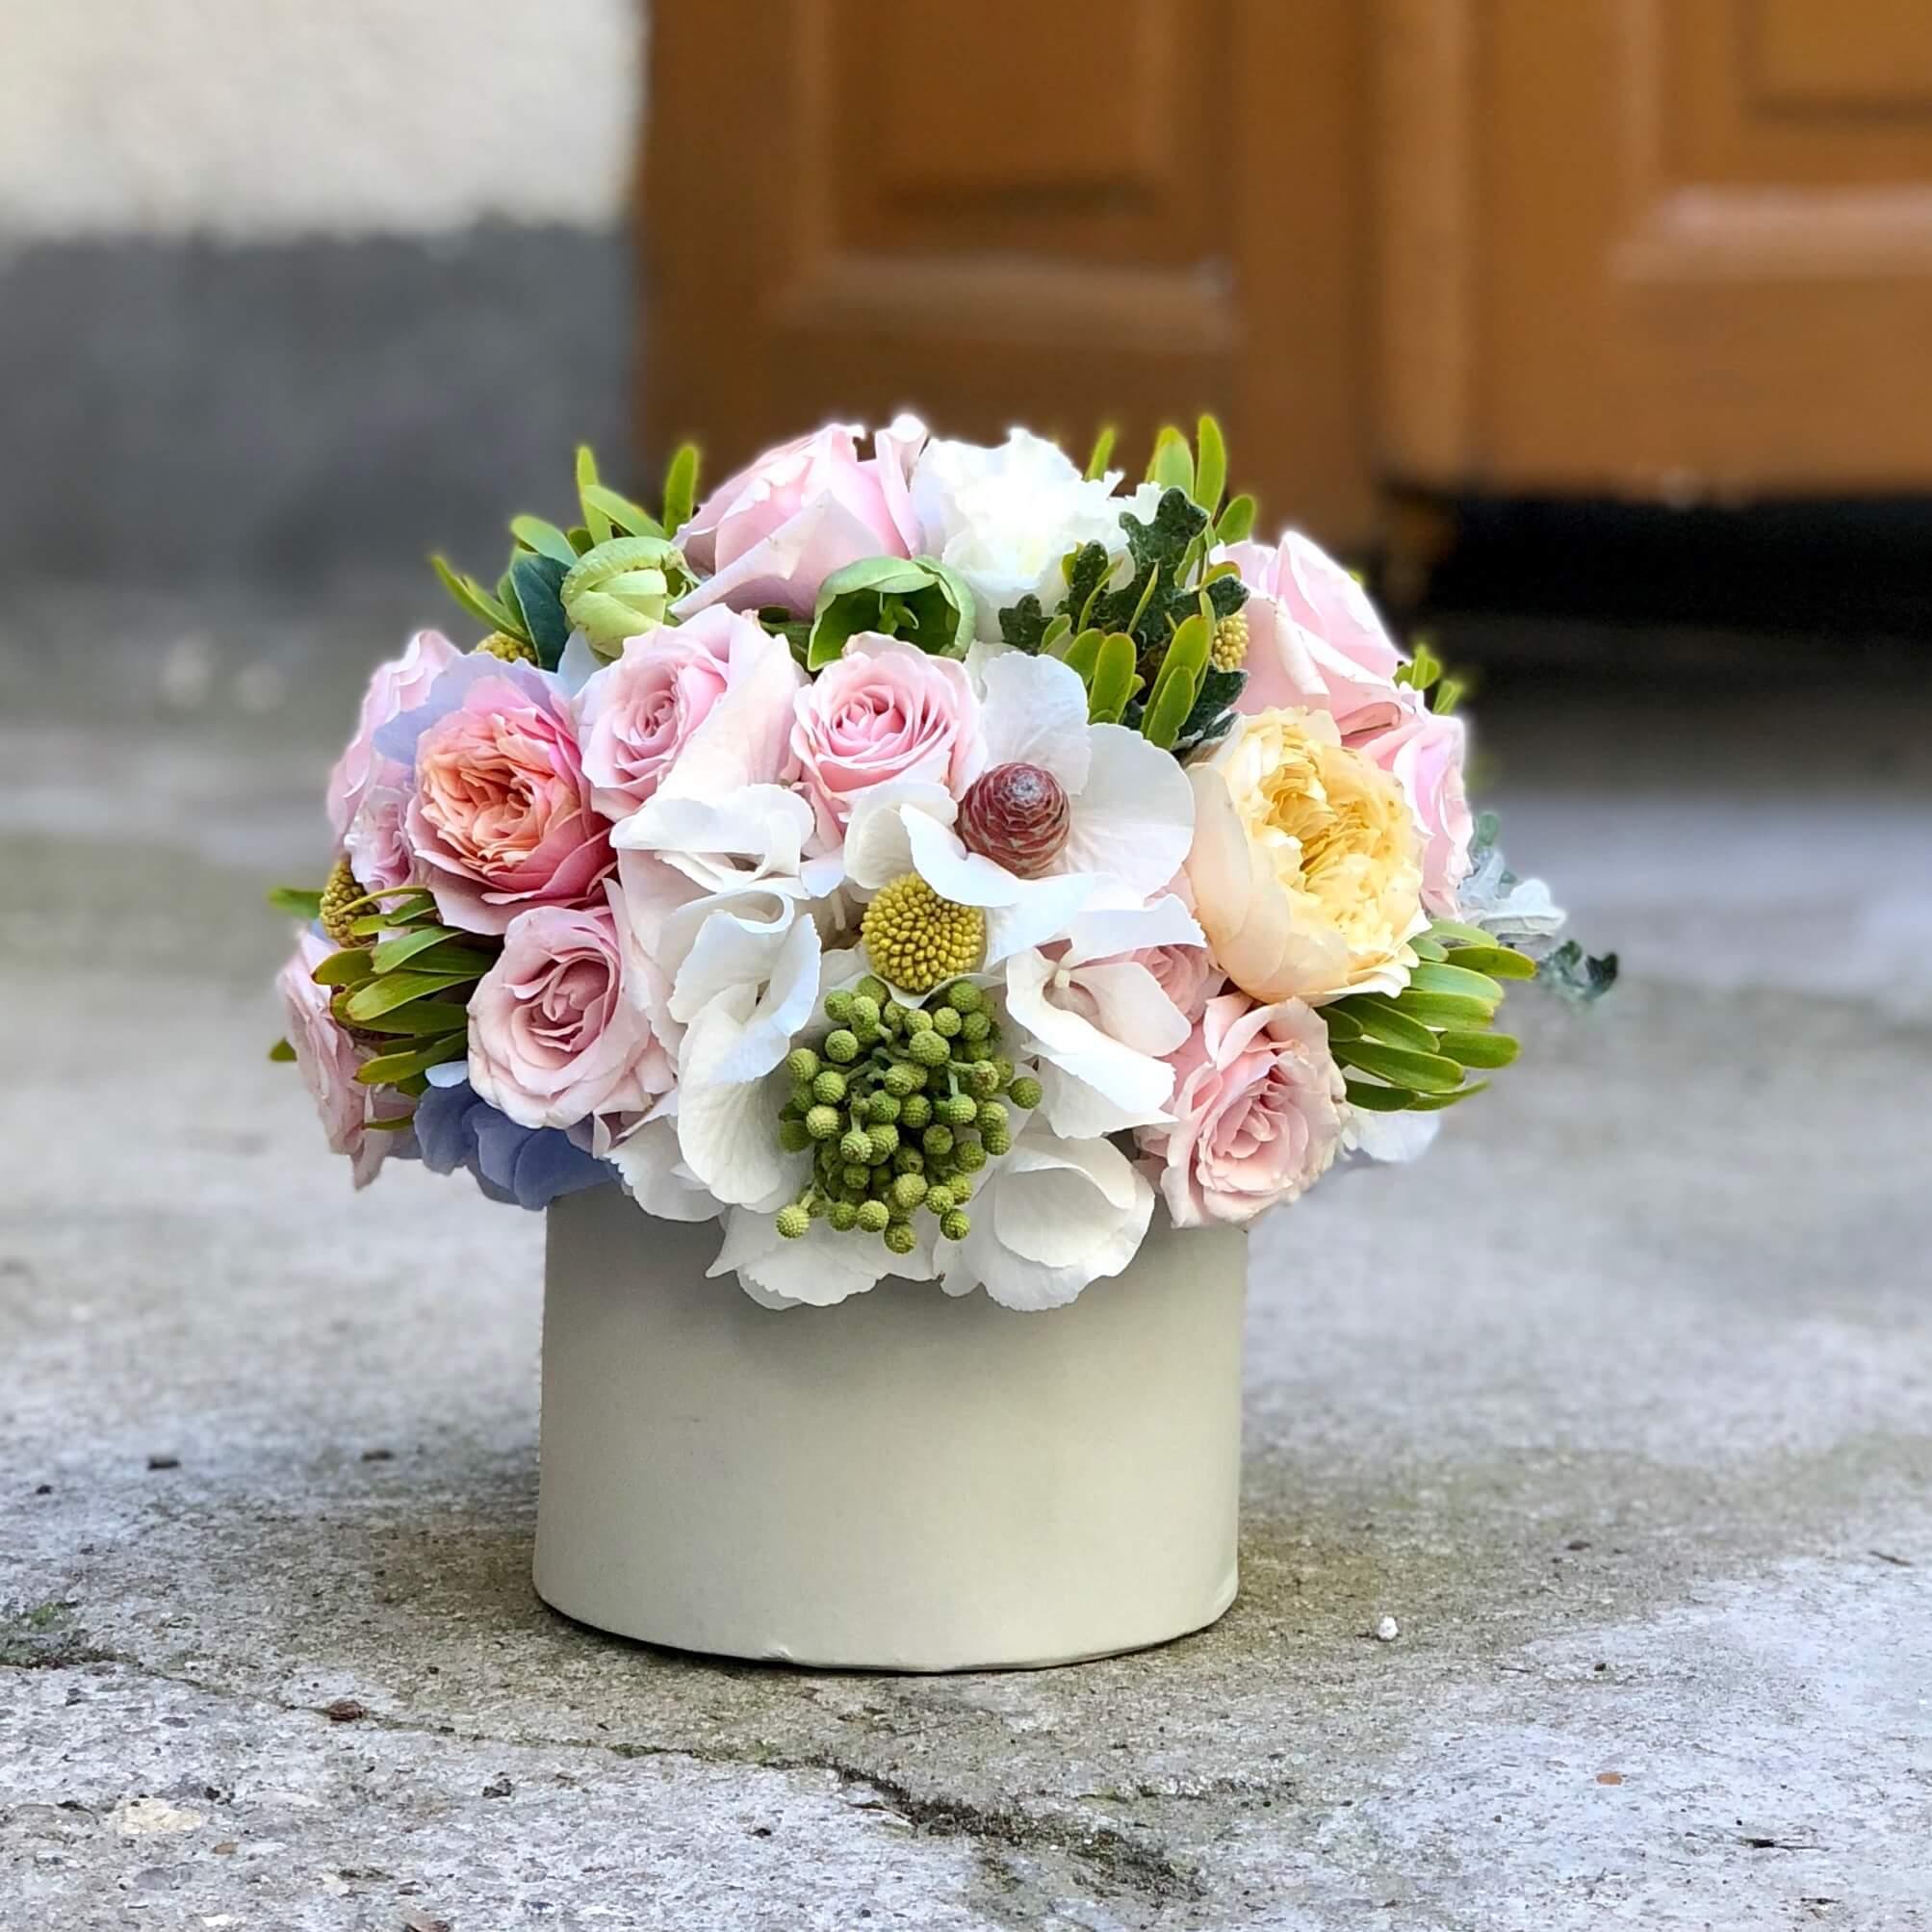 Aranjament Floral In Cutie Cu Hortensia Alba Imodflowers